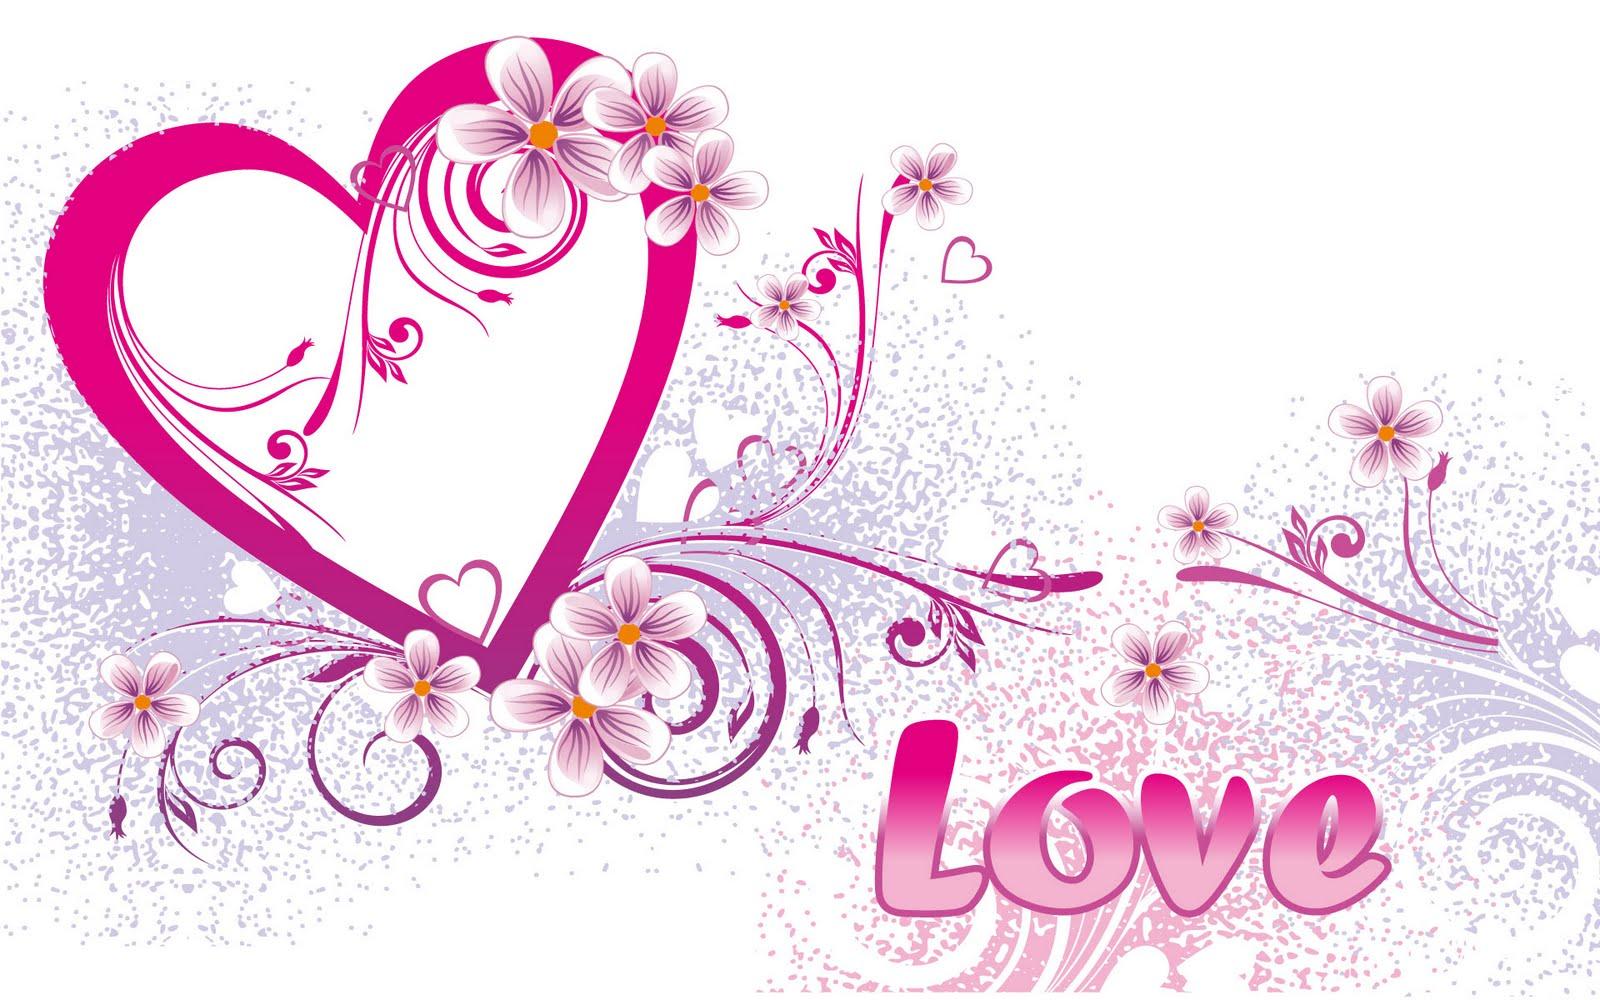 http://3.bp.blogspot.com/-8ZWLHzjE9RI/Tn9DvotazgI/AAAAAAAABZM/KA7IvEvzYyE/s1600/valentines-love-wallpaper.jpg